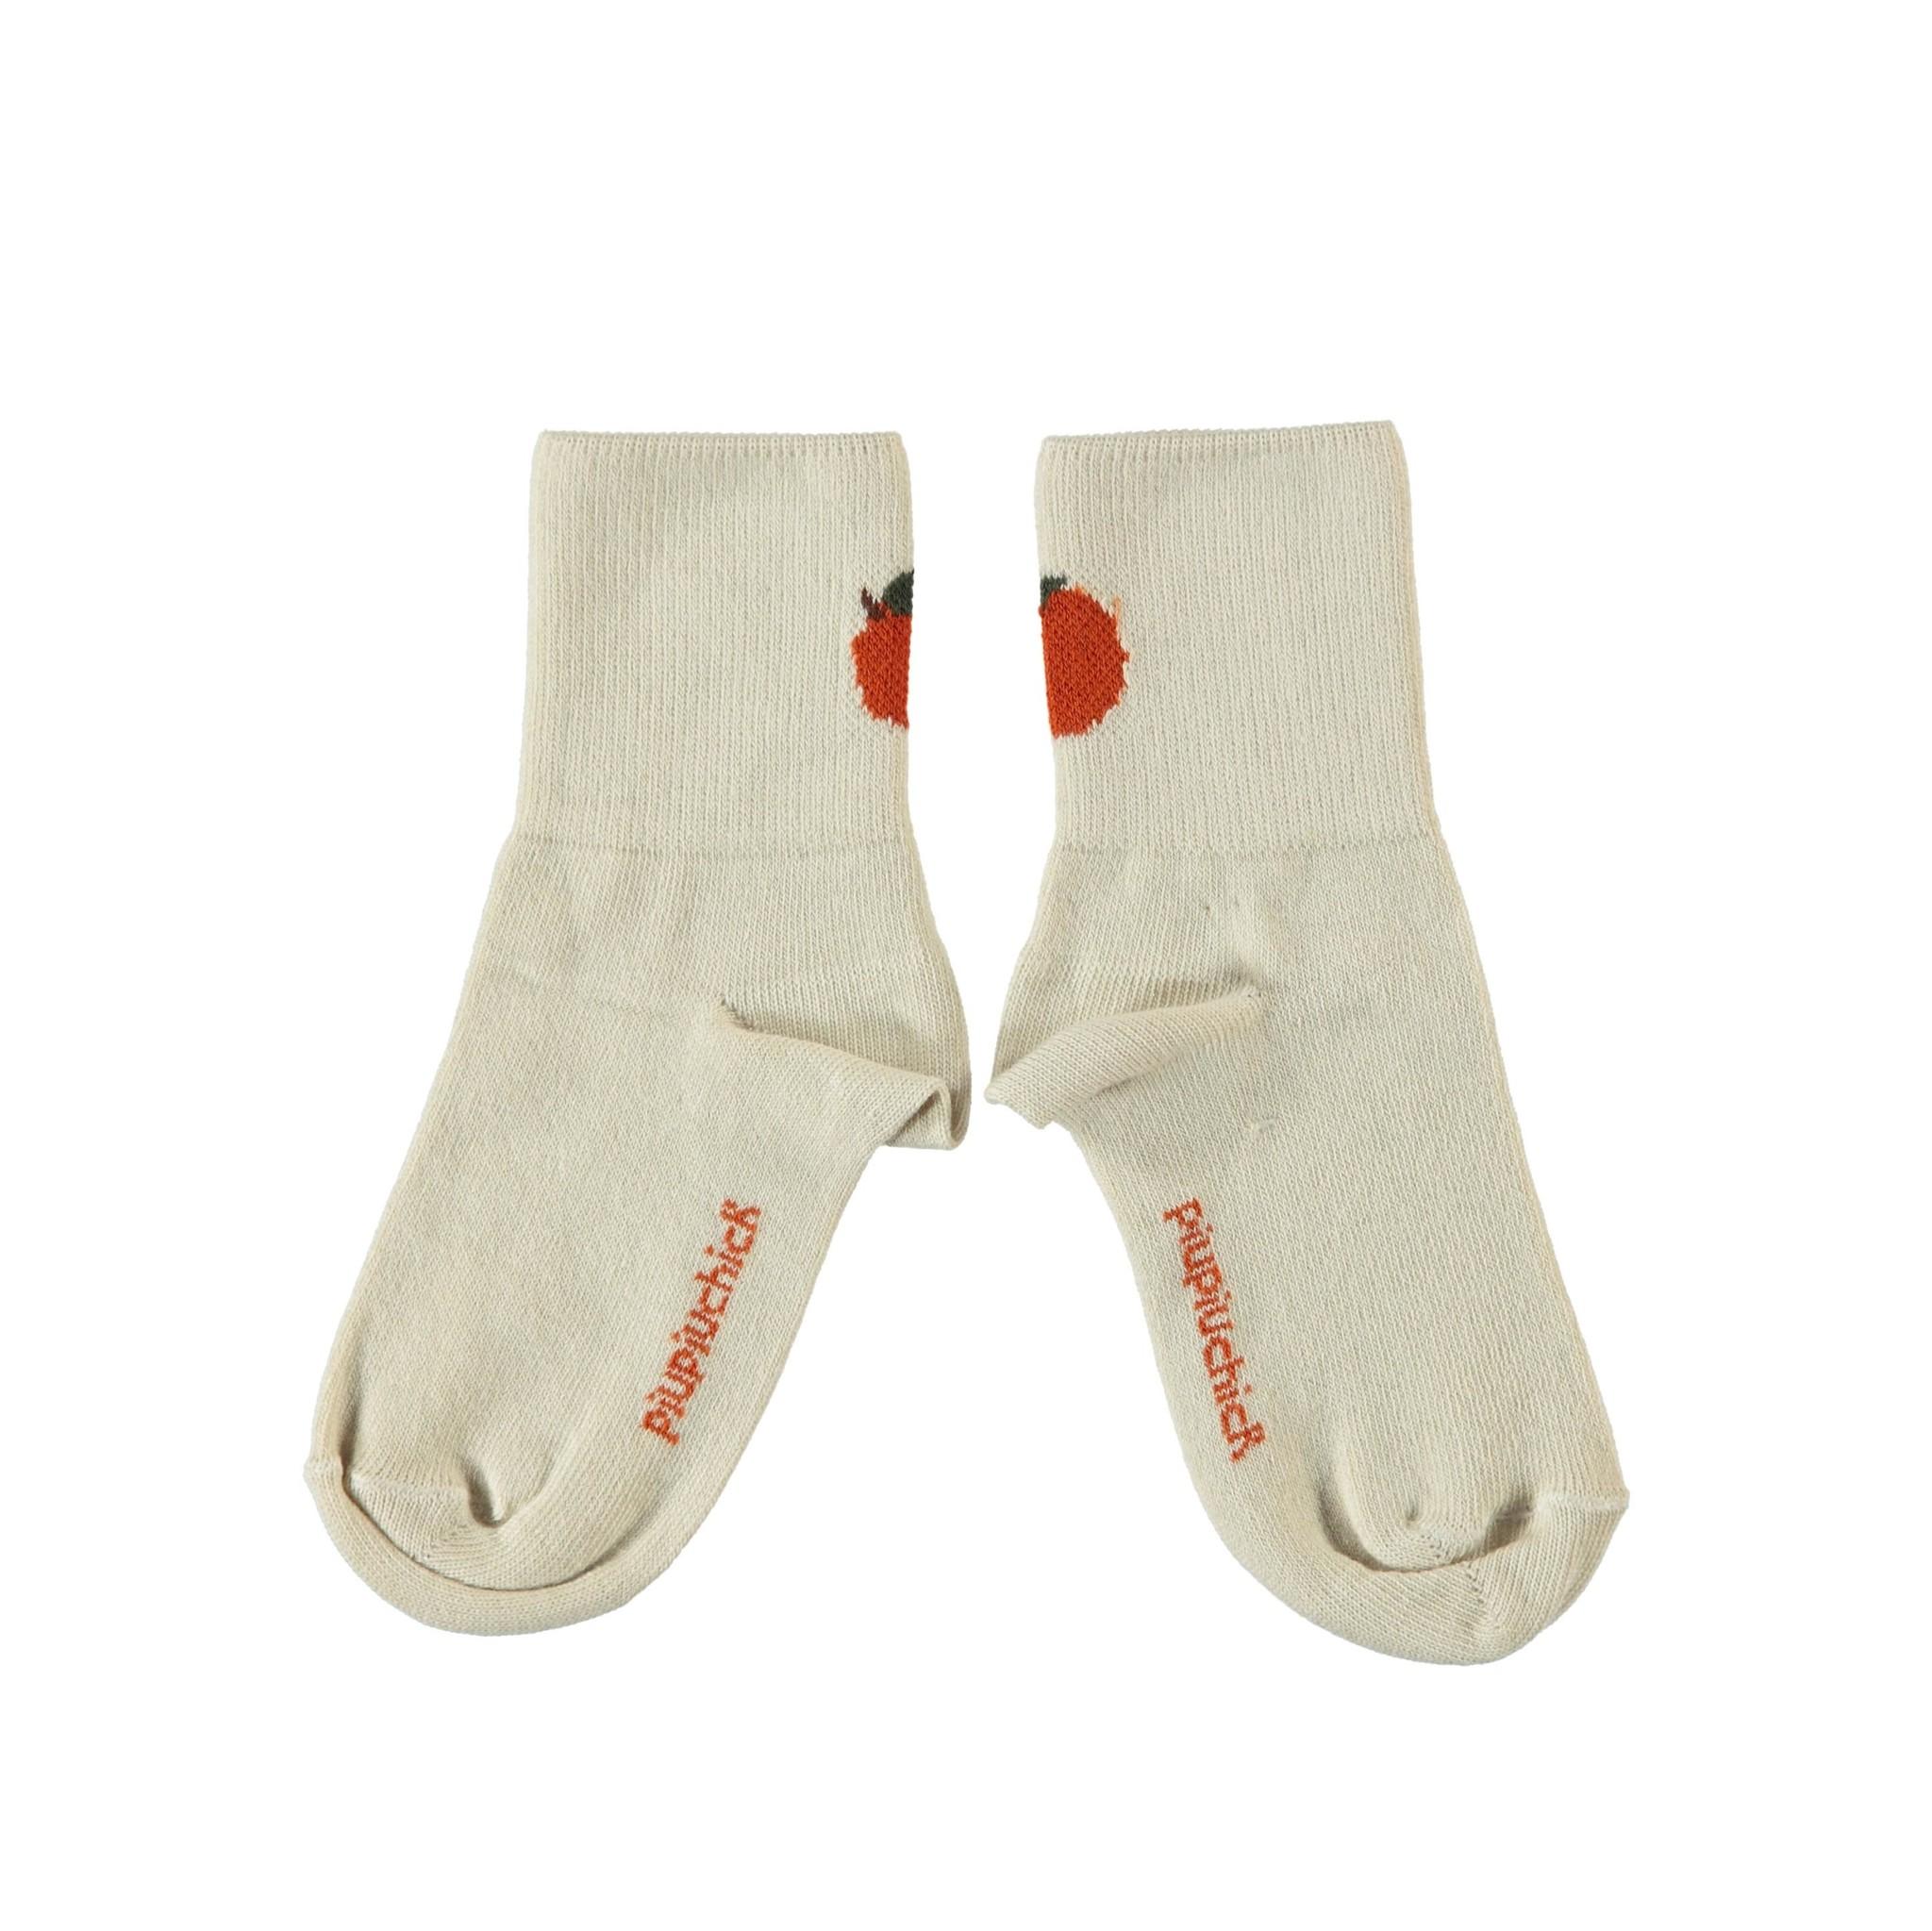 piupiuchick Short socks, with back peach detail